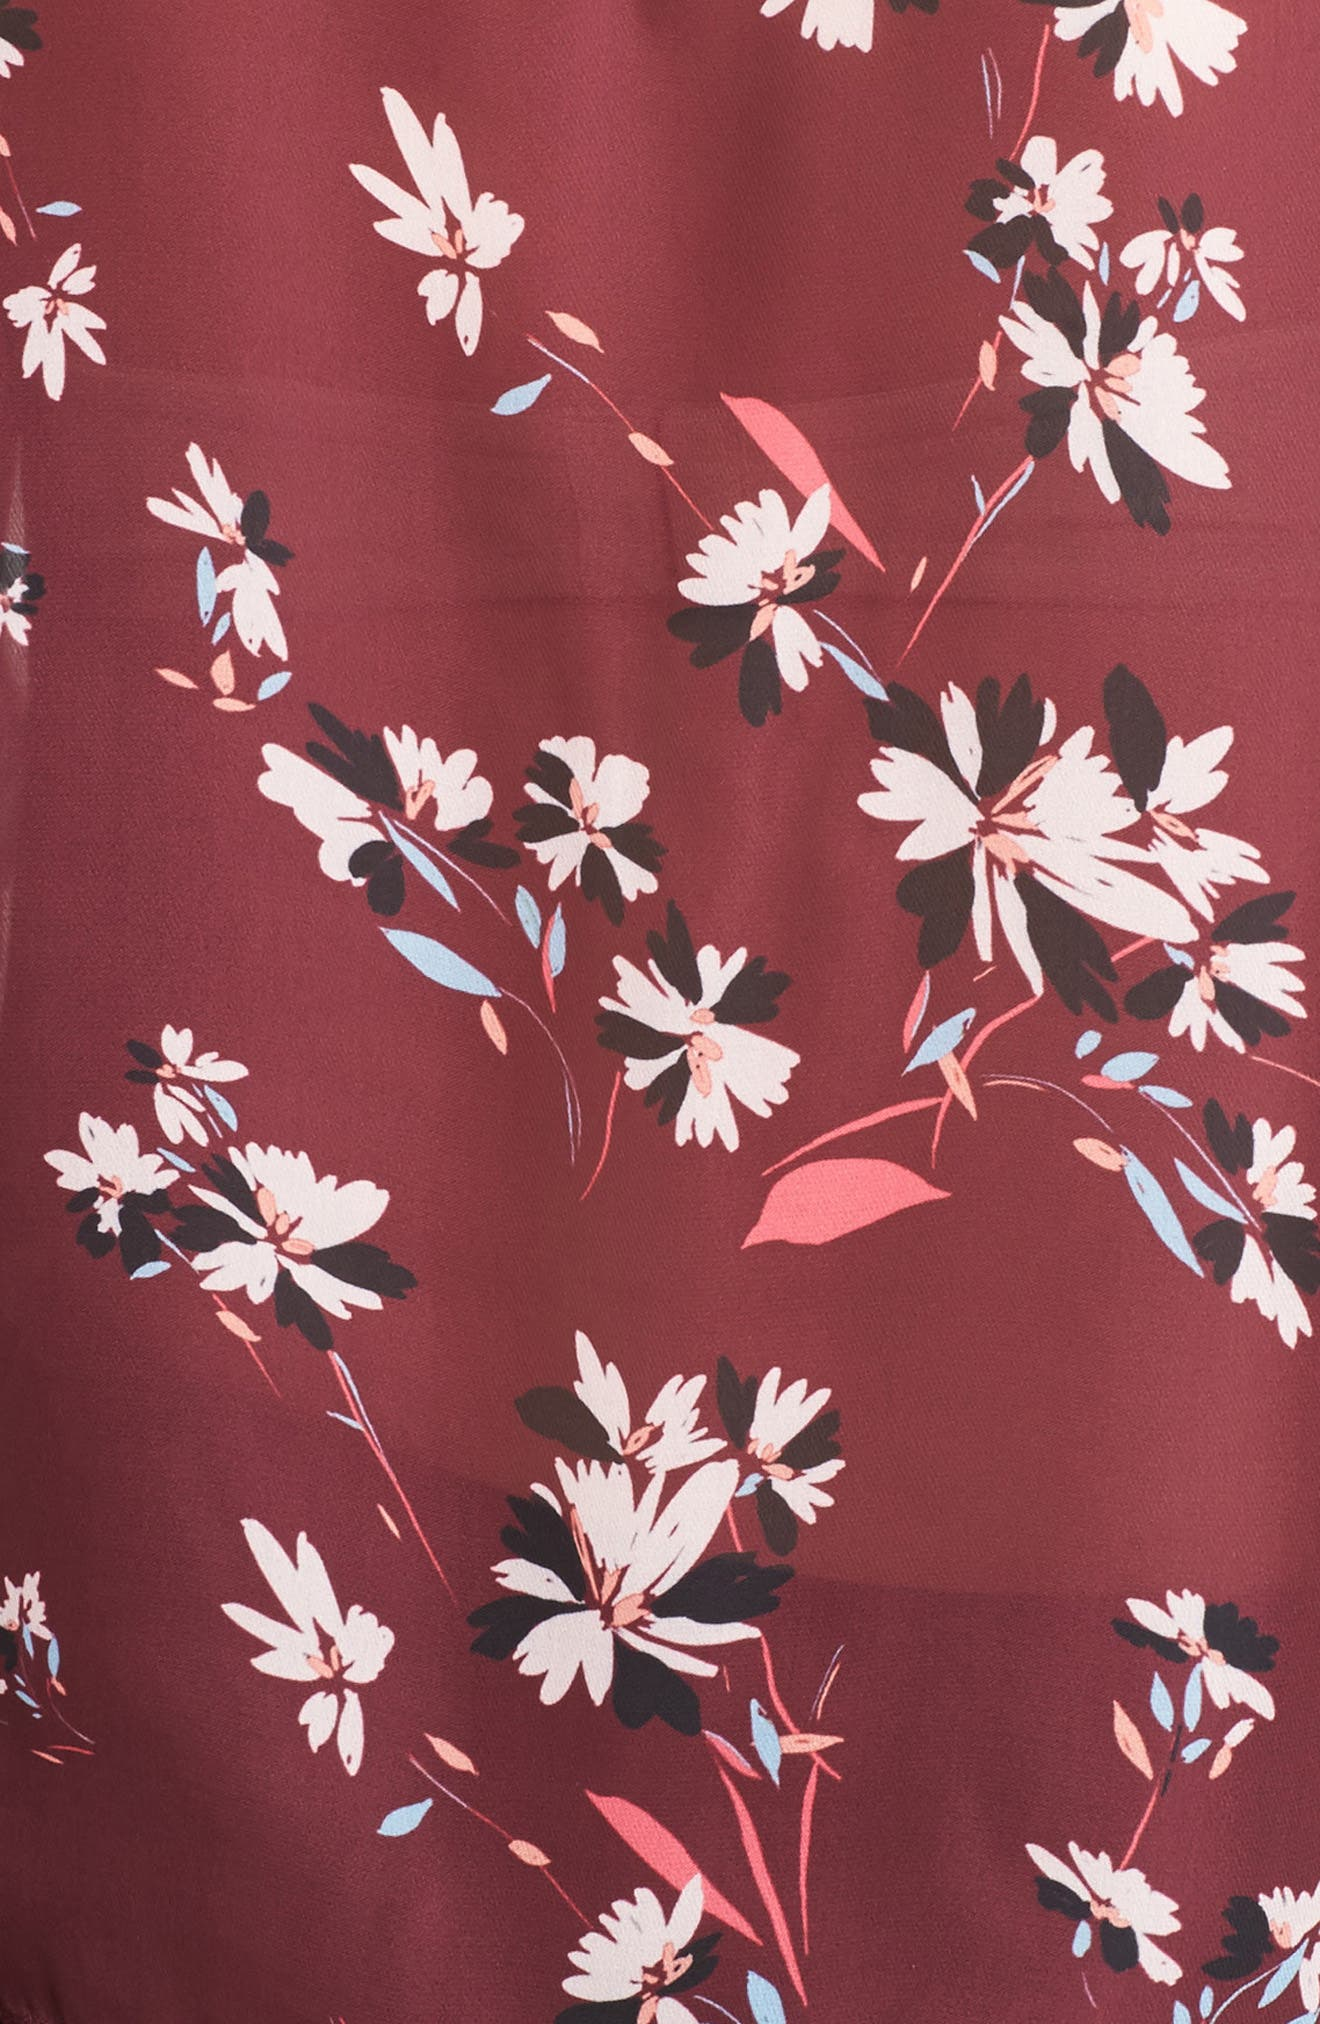 Sonoma Bell Sleeve Blouse,                             Alternate thumbnail 5, color,                             930